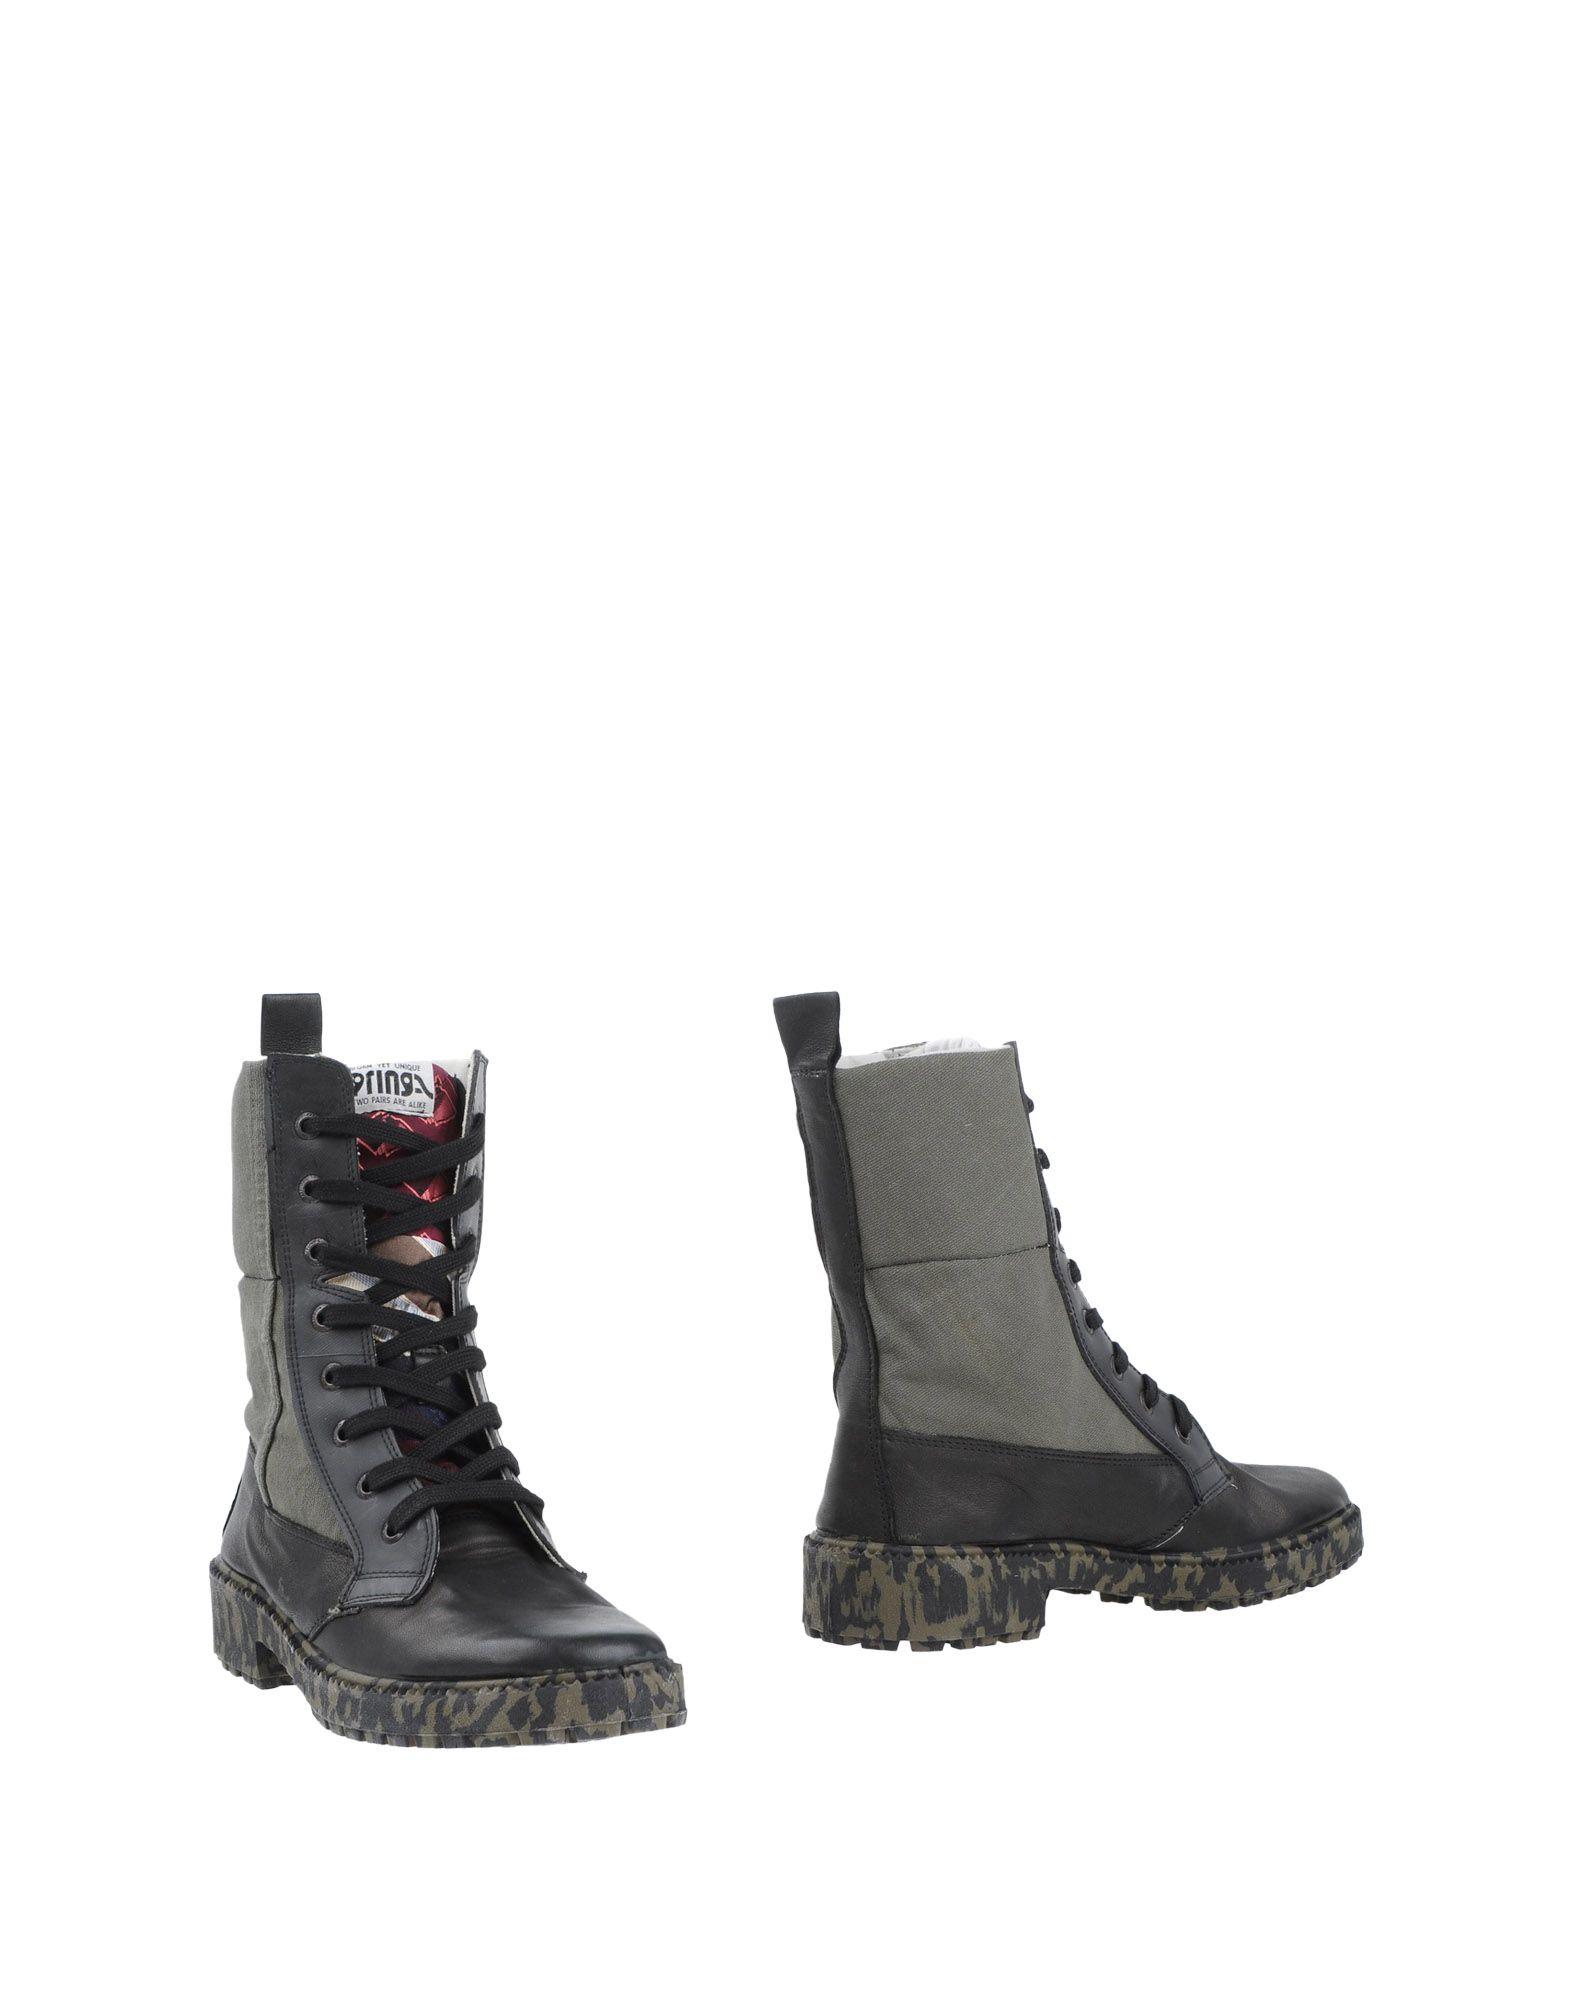 Springa Stiefelette Damen Damen Damen  11328455FF Gute Qualität beliebte Schuhe c8ec09